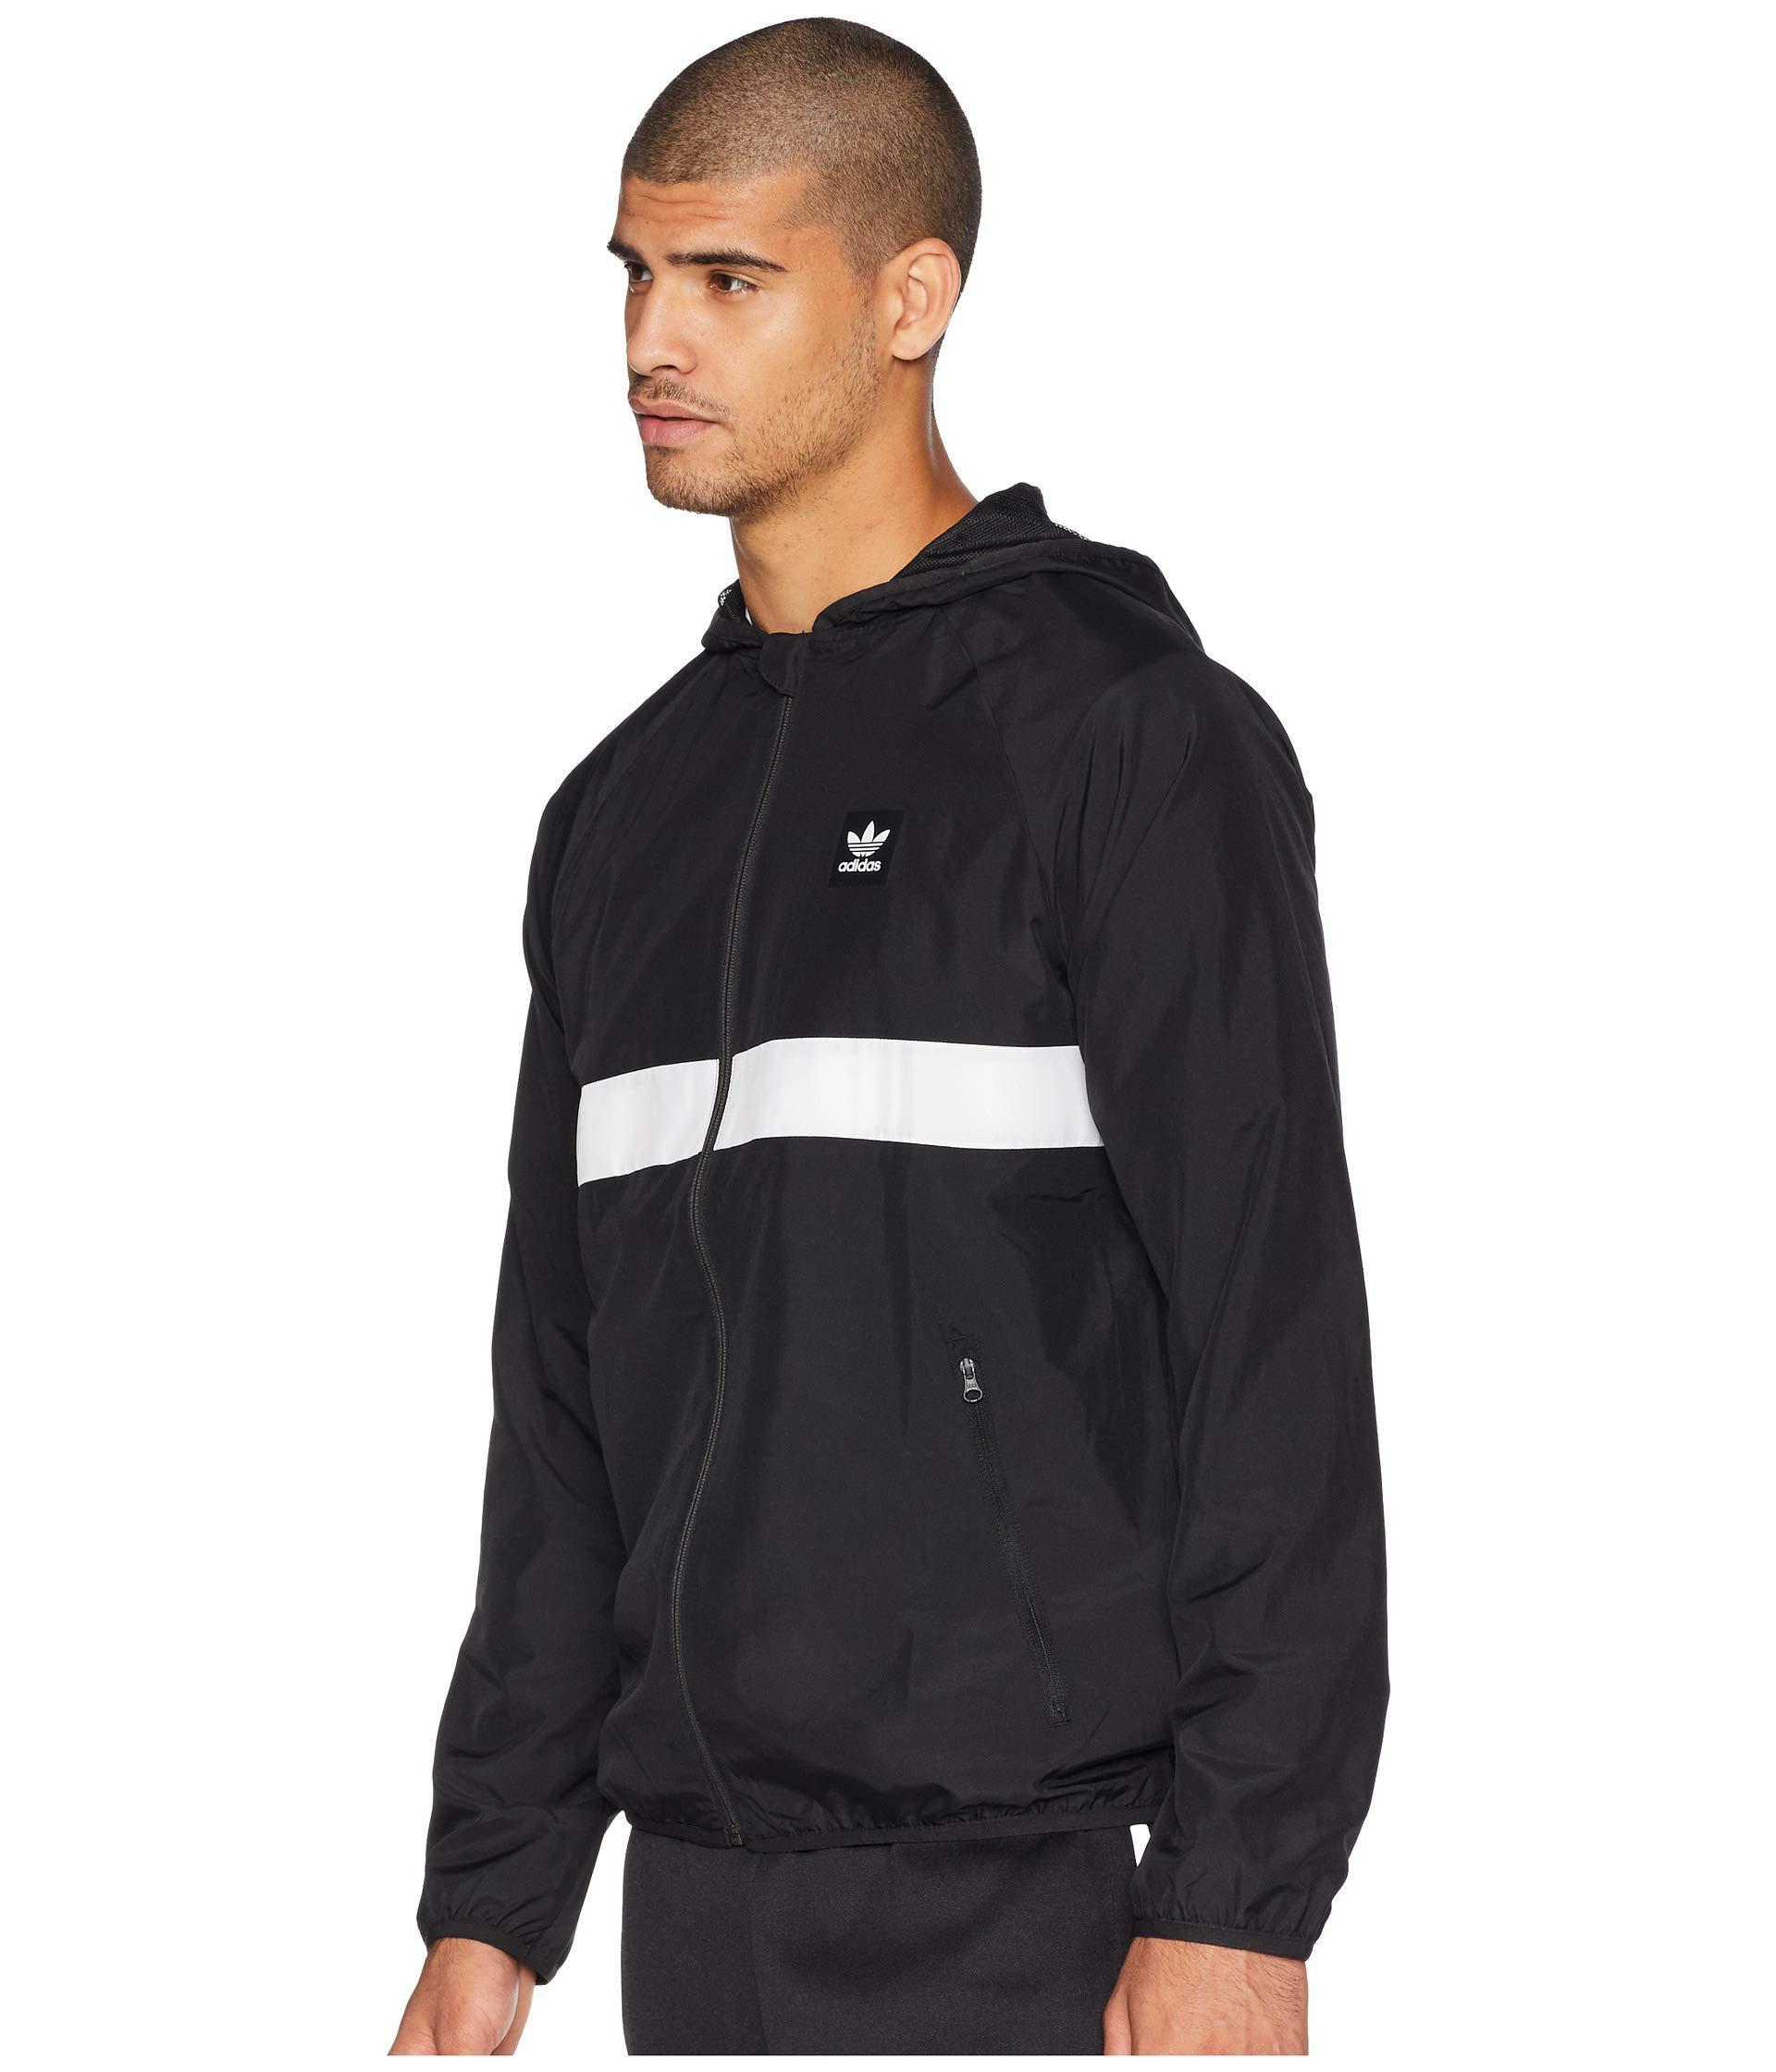 bb29dab0eeb2 Lyst - adidas Originals Blackbird Packable Wind Jacket (black white) Men s  Coat in Black for Men